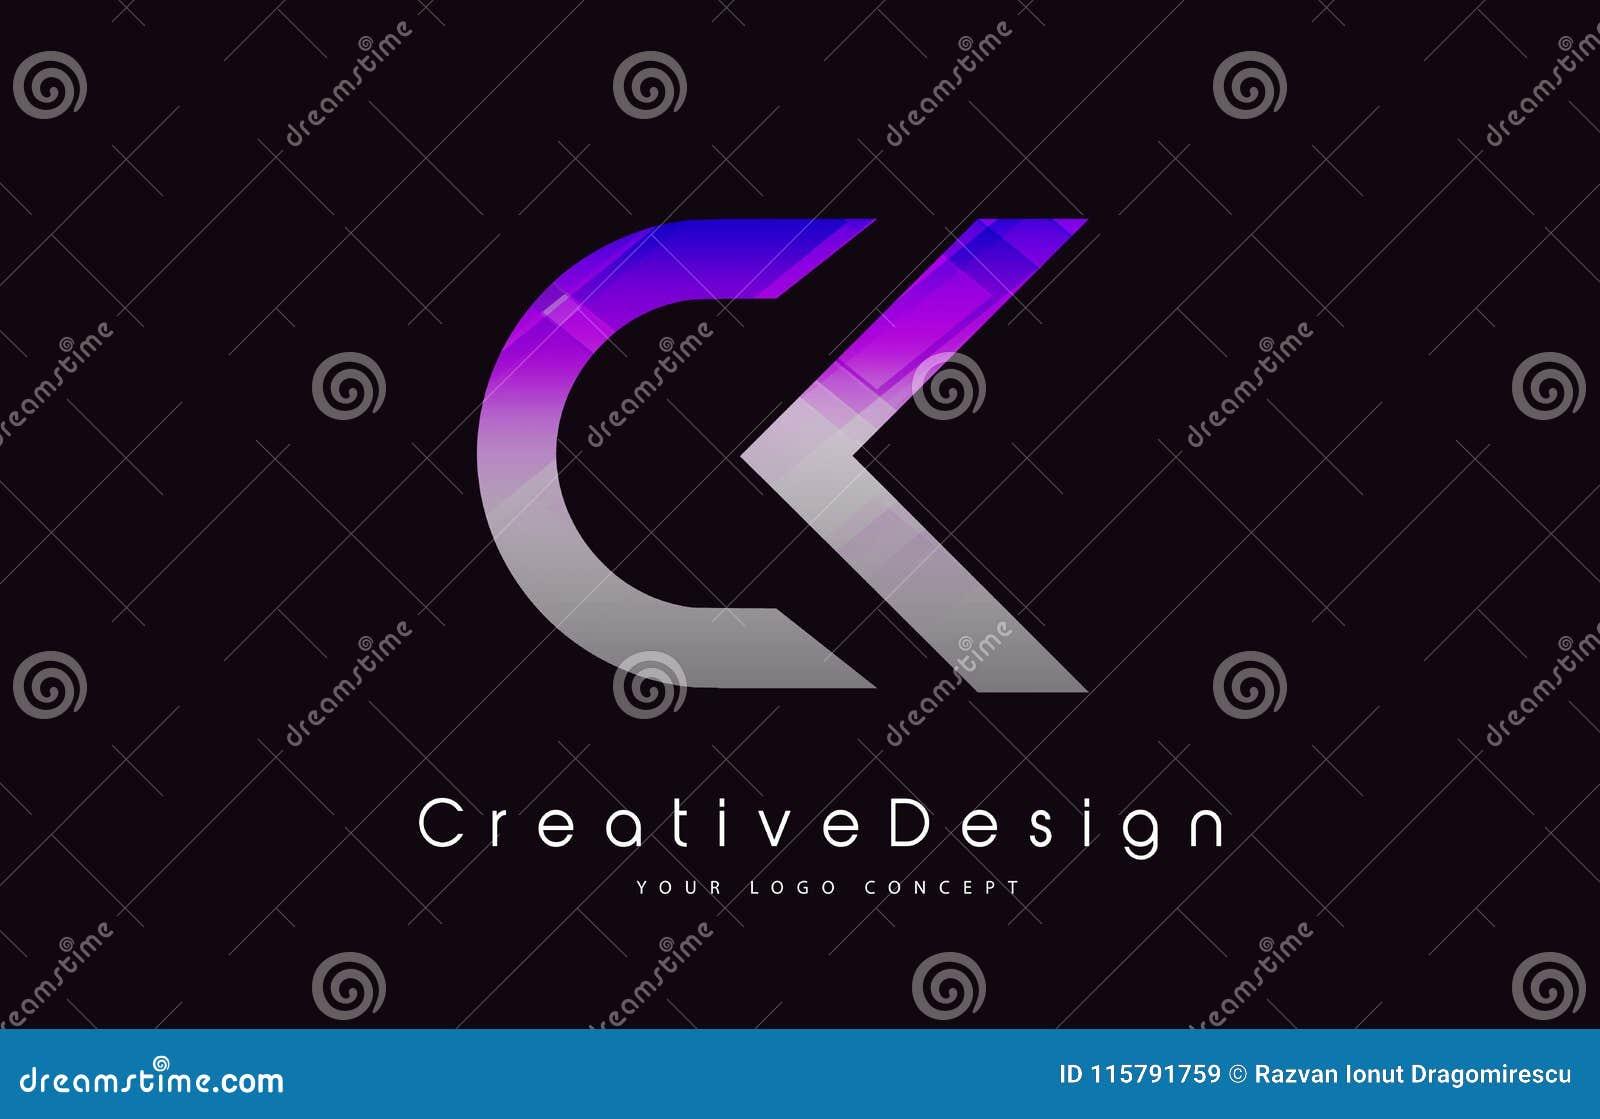 De Brief Logo Design van CK Purper Textuur Creatief Pictogram Moderne Lette